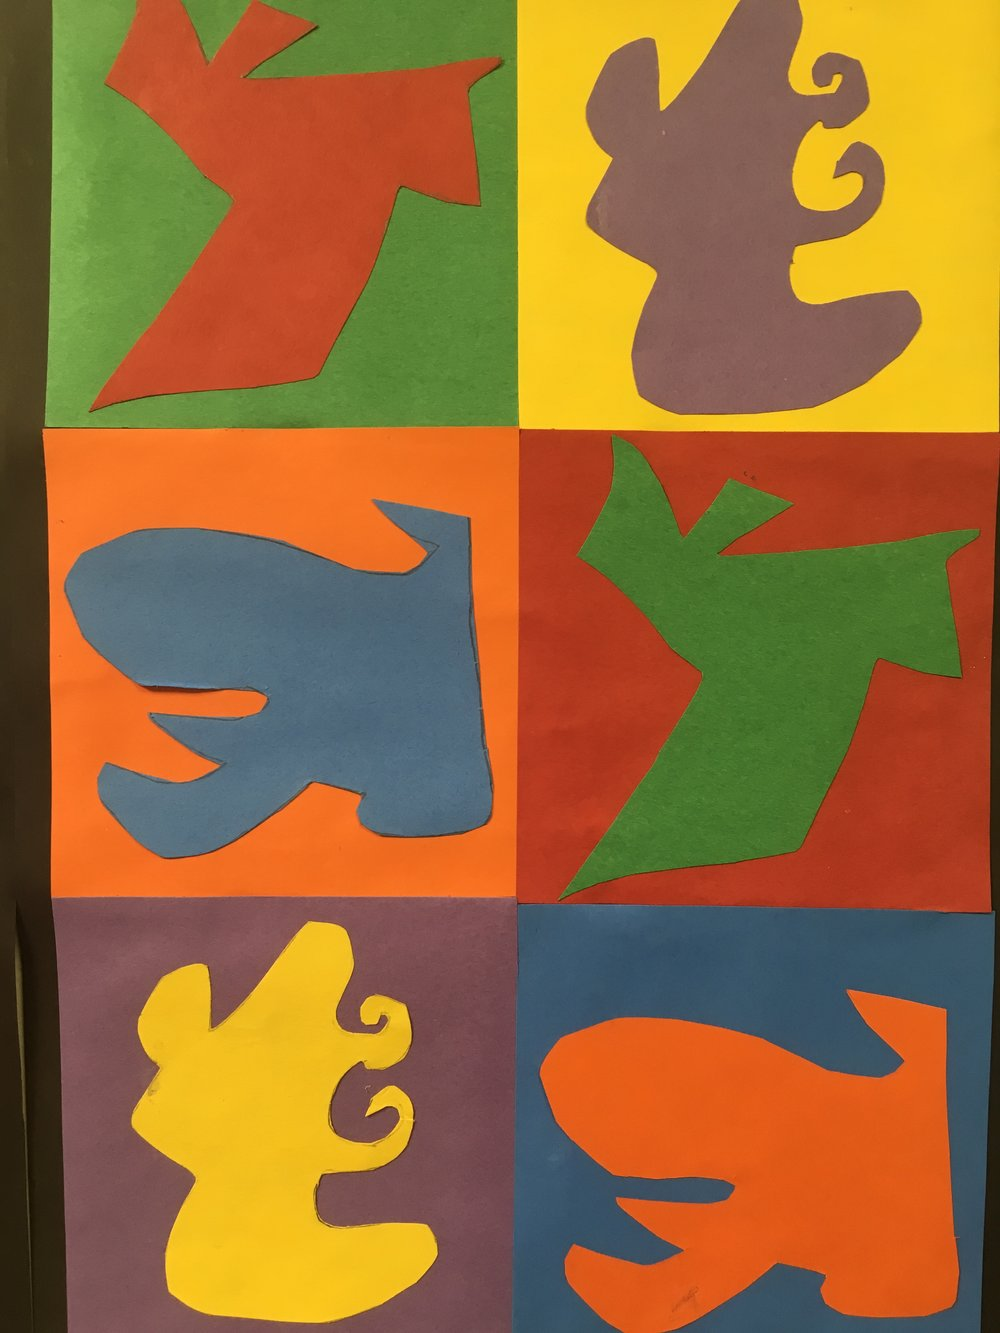 5th shapes 2.JPG